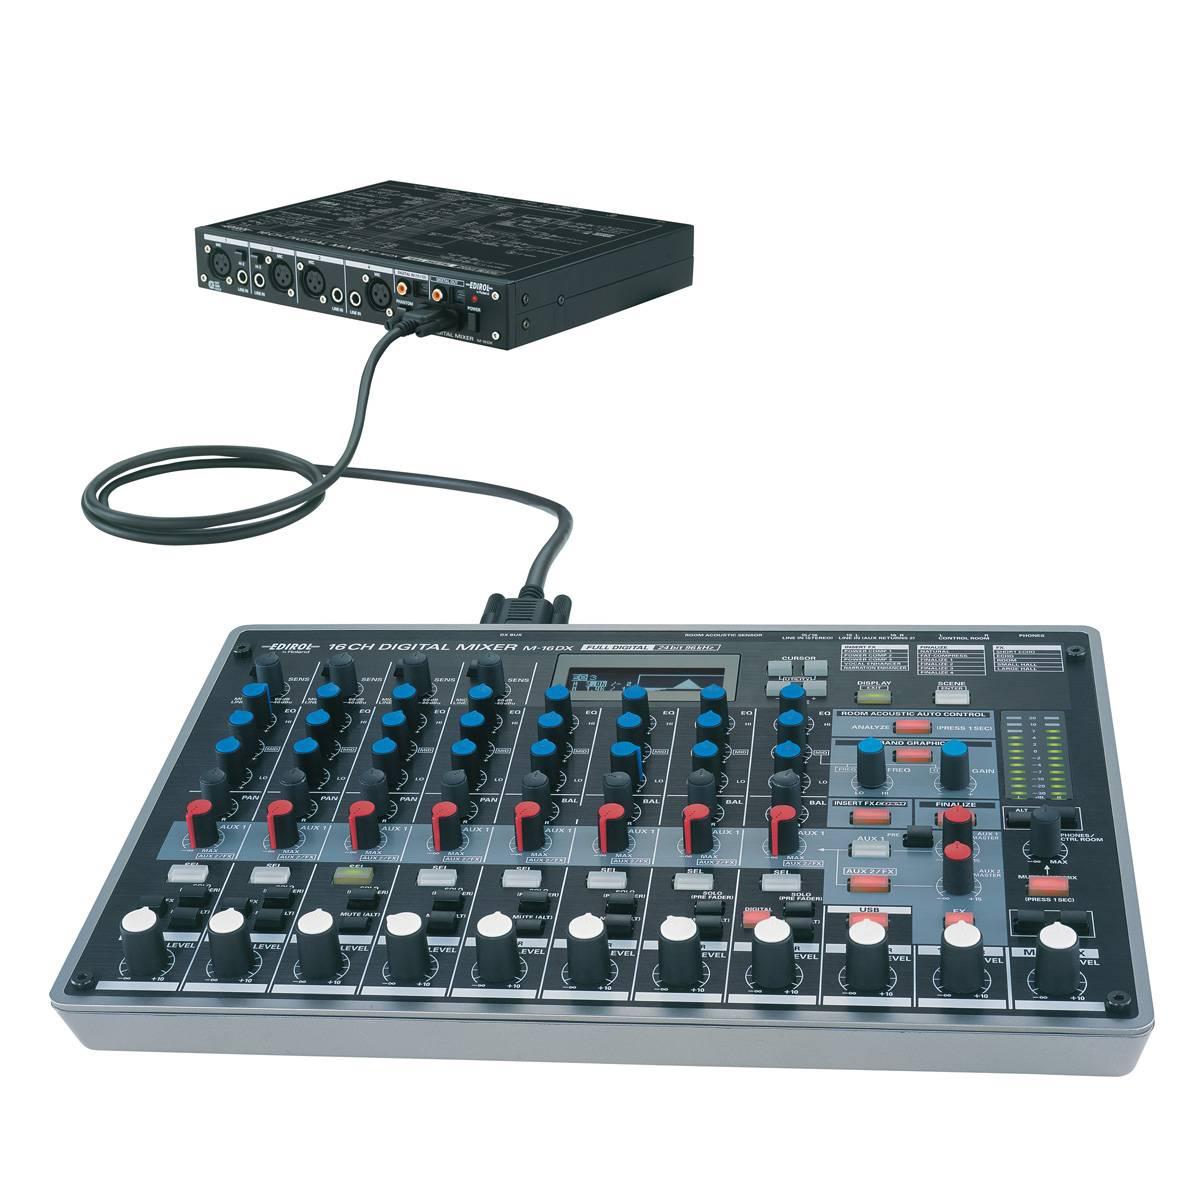 edirol m 16dx digital audio mixer interface usb interfaces from inta audio uk. Black Bedroom Furniture Sets. Home Design Ideas